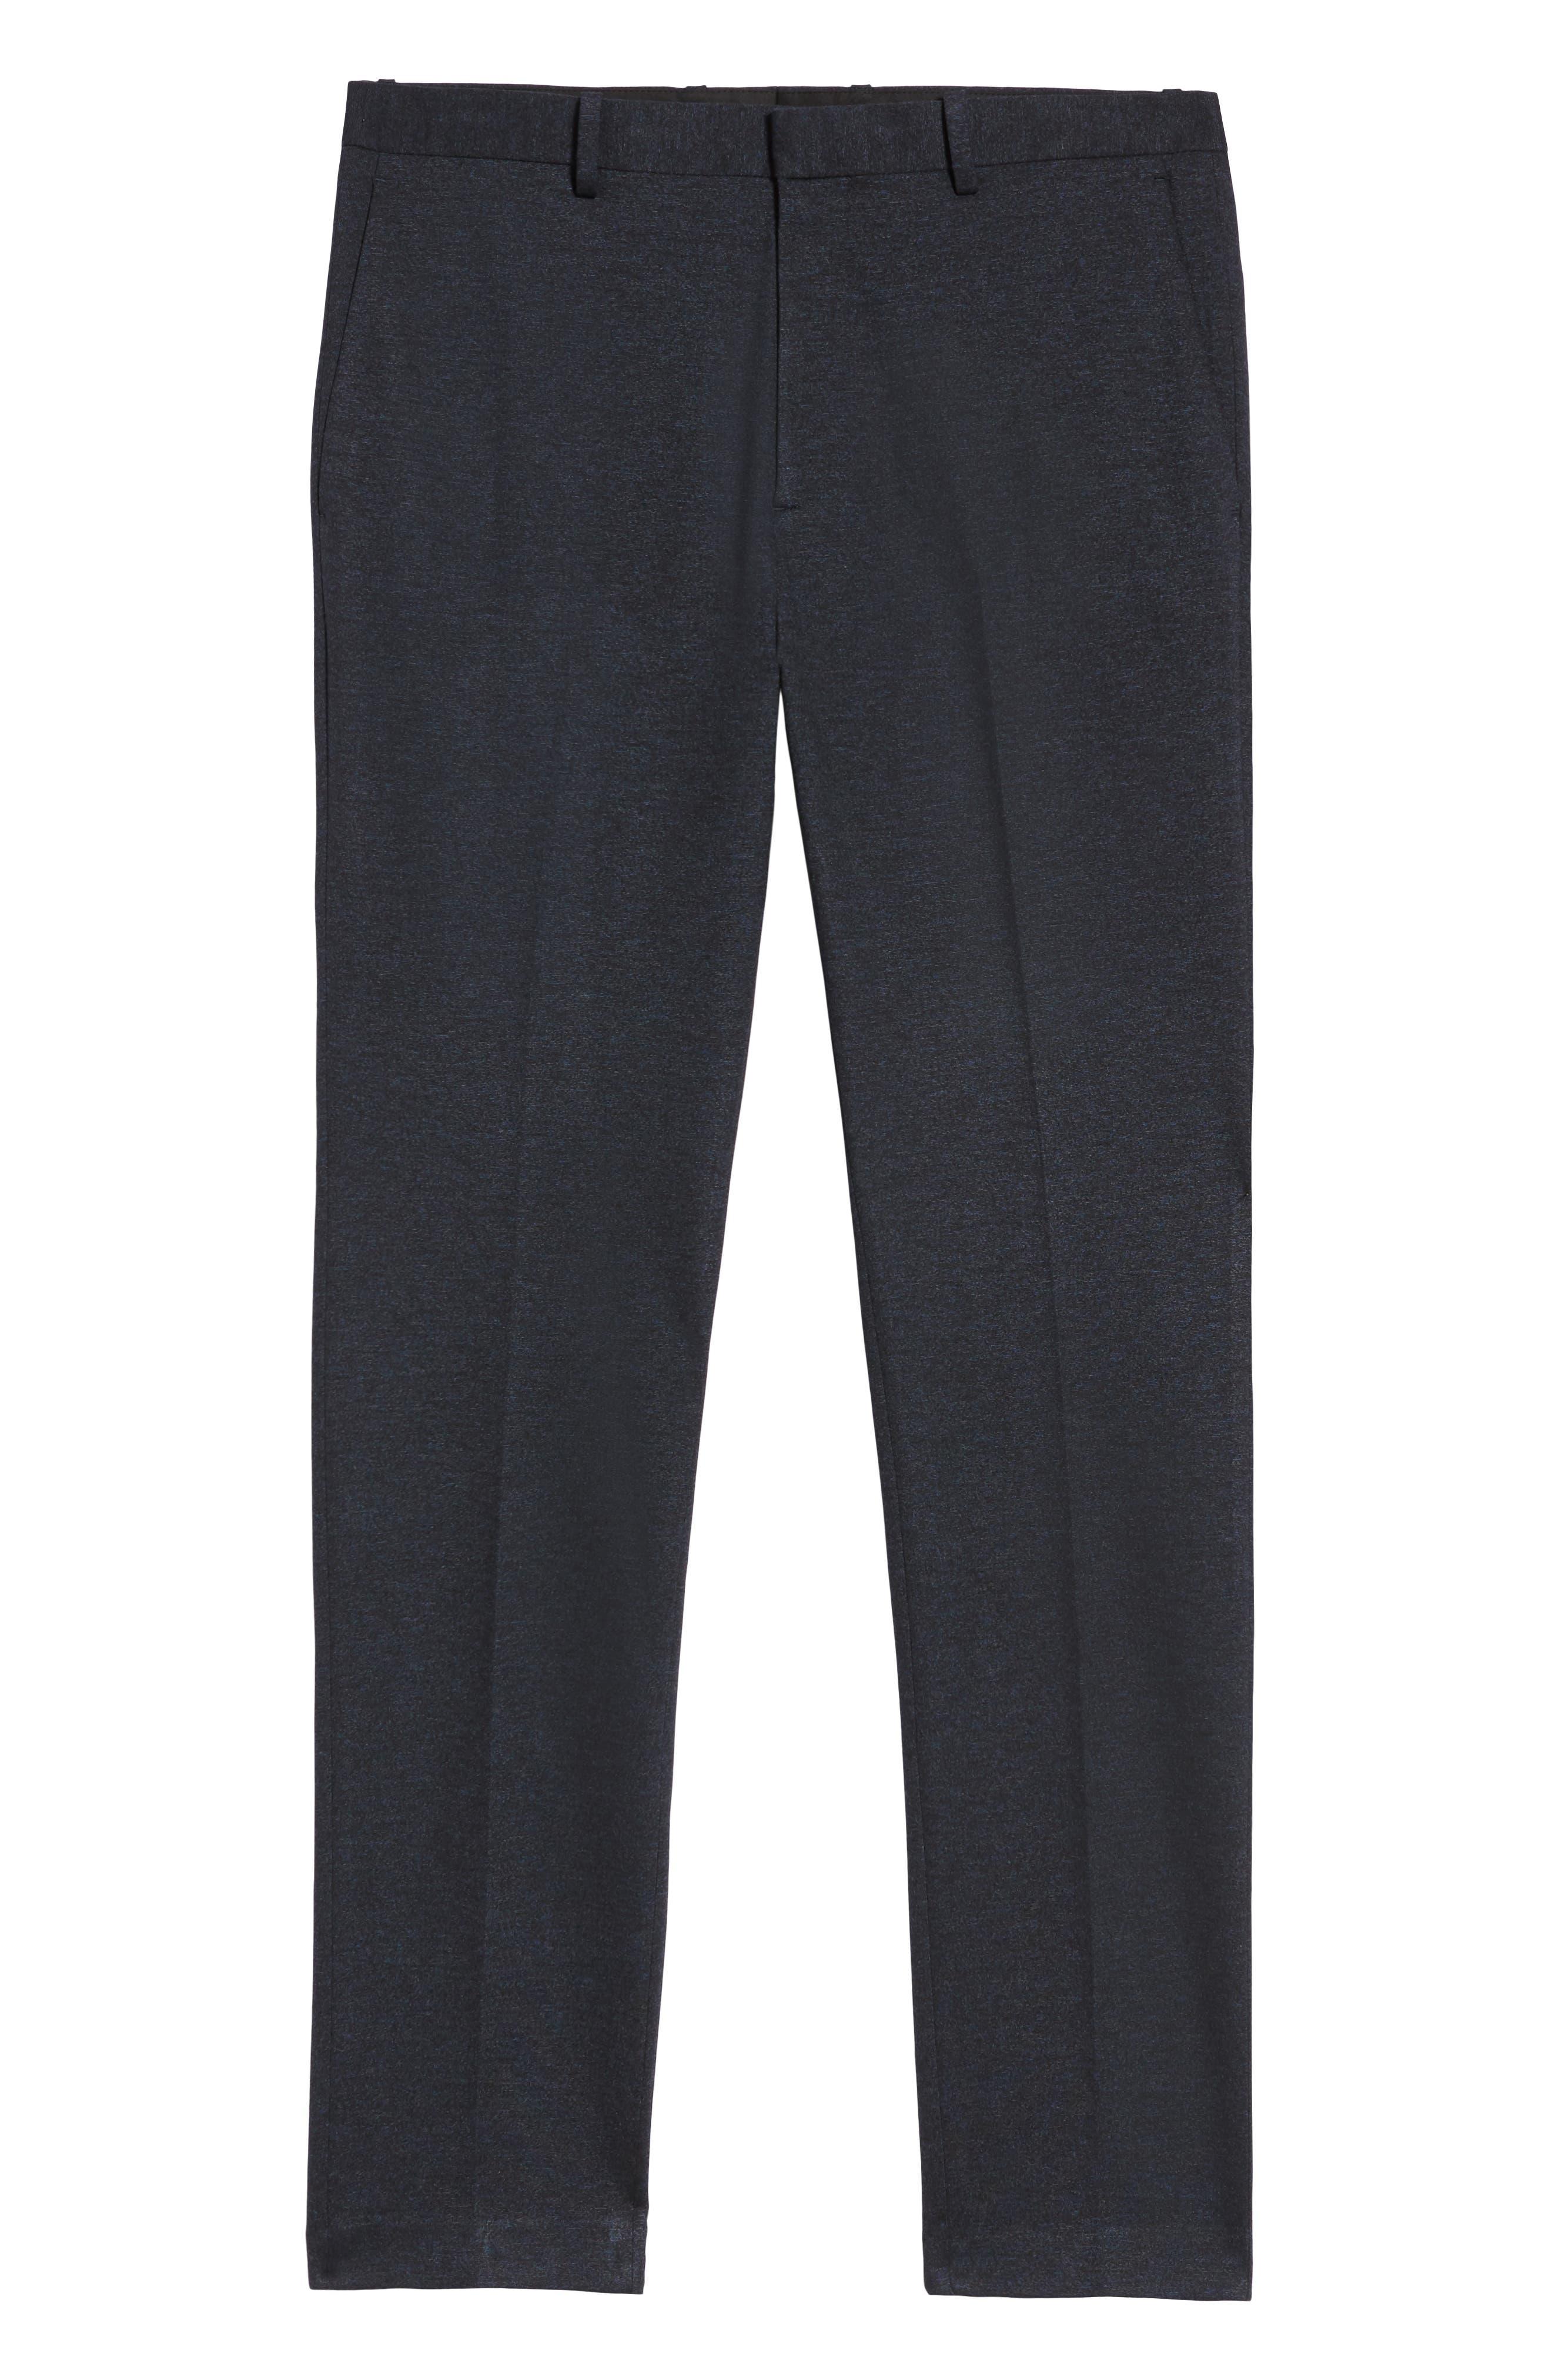 Payton Marled Ponte Trousers,                             Alternate thumbnail 6, color,                             ECLIPSE MELANGE